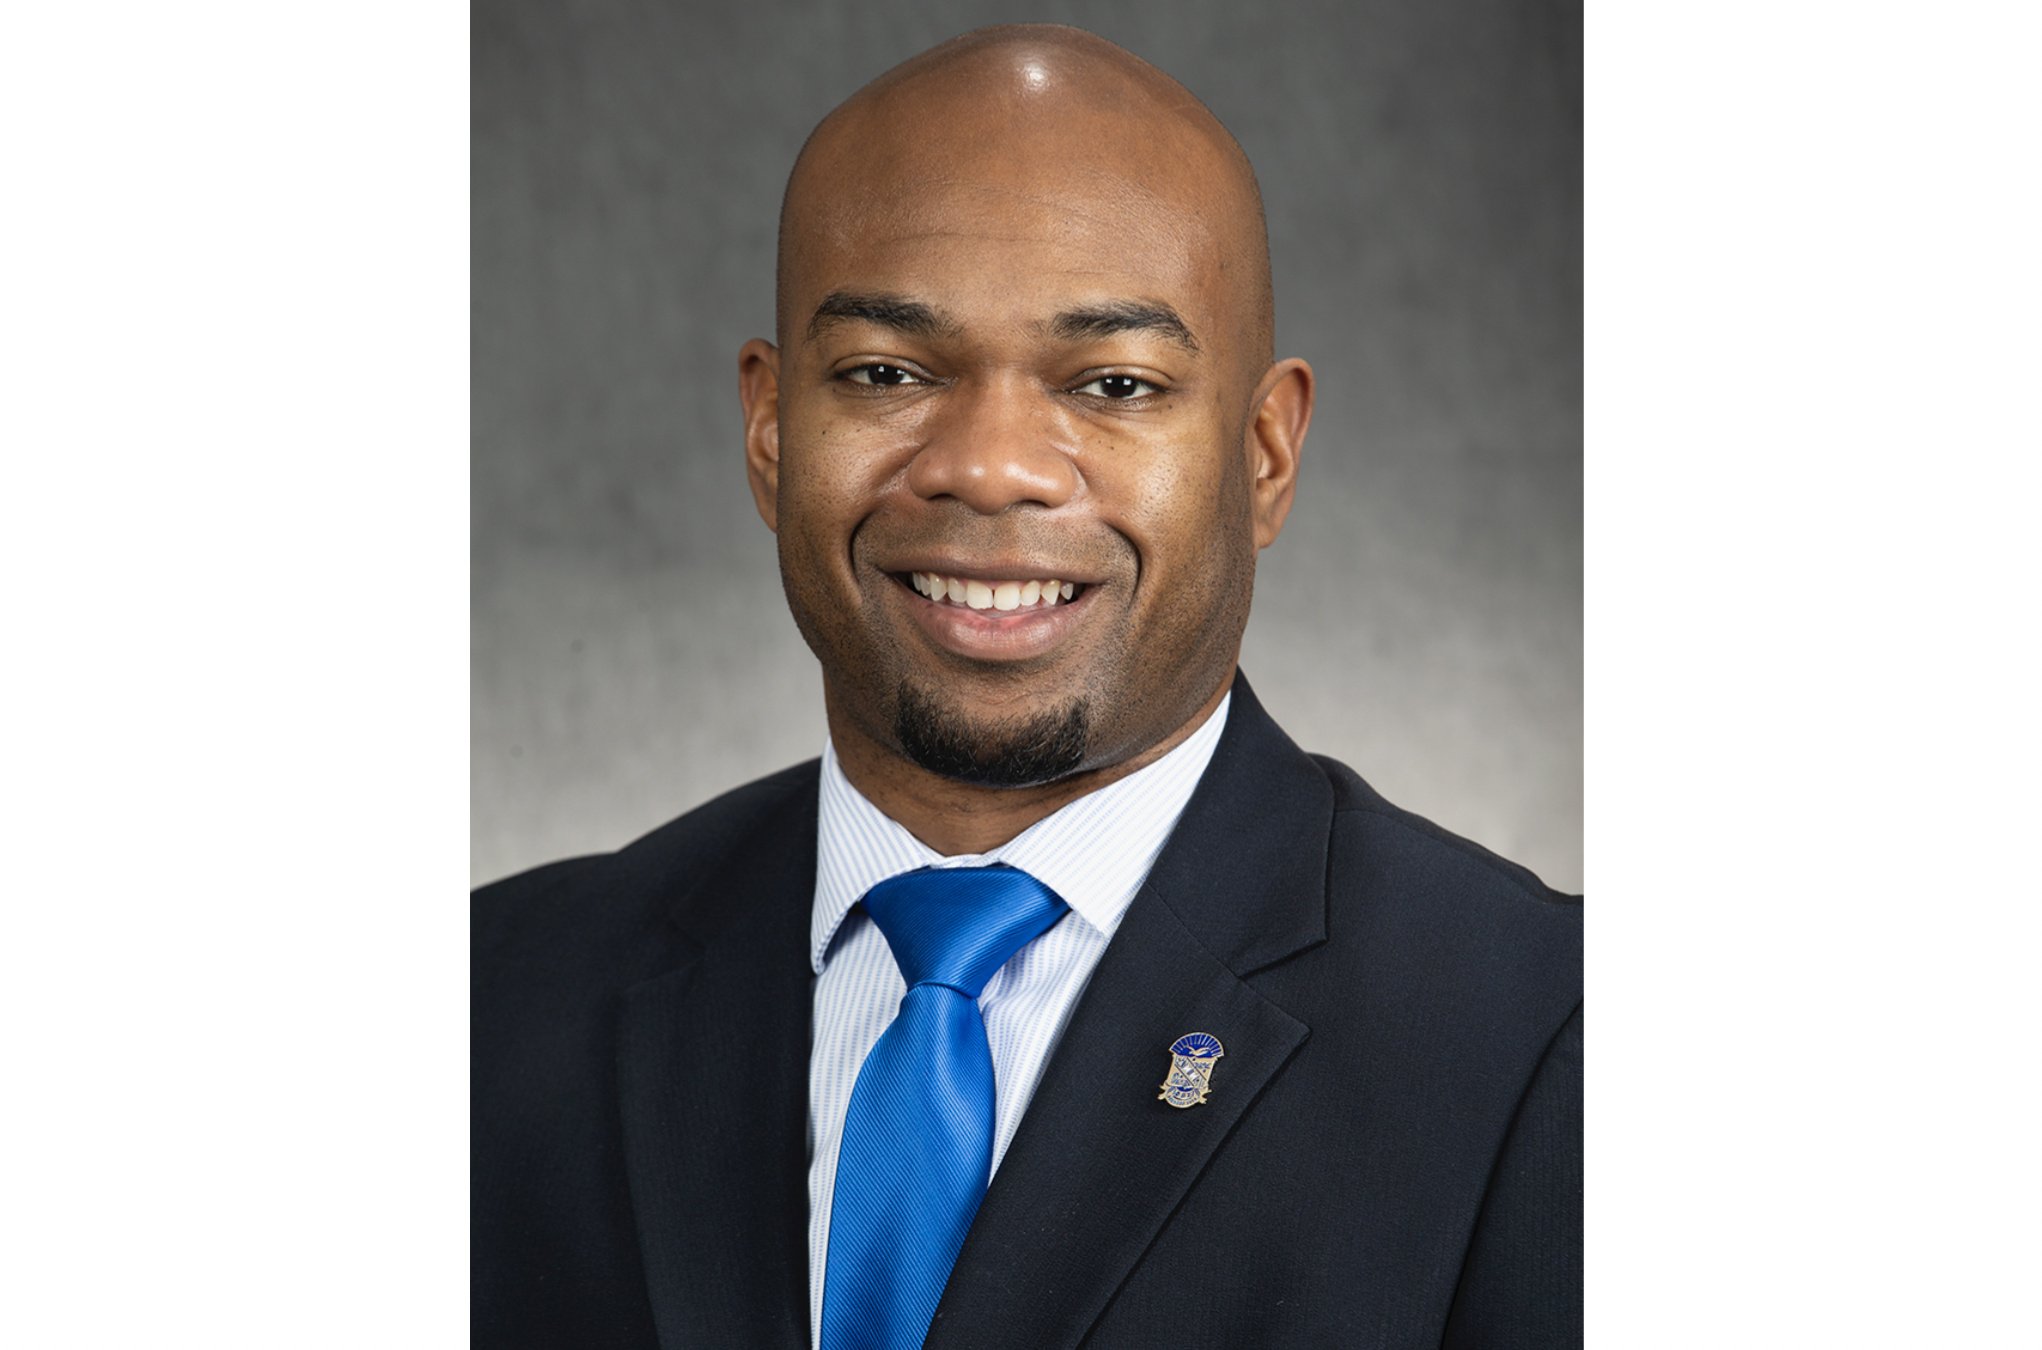 Legislator's job as teacher union lawyer raises conflict of interest concerns